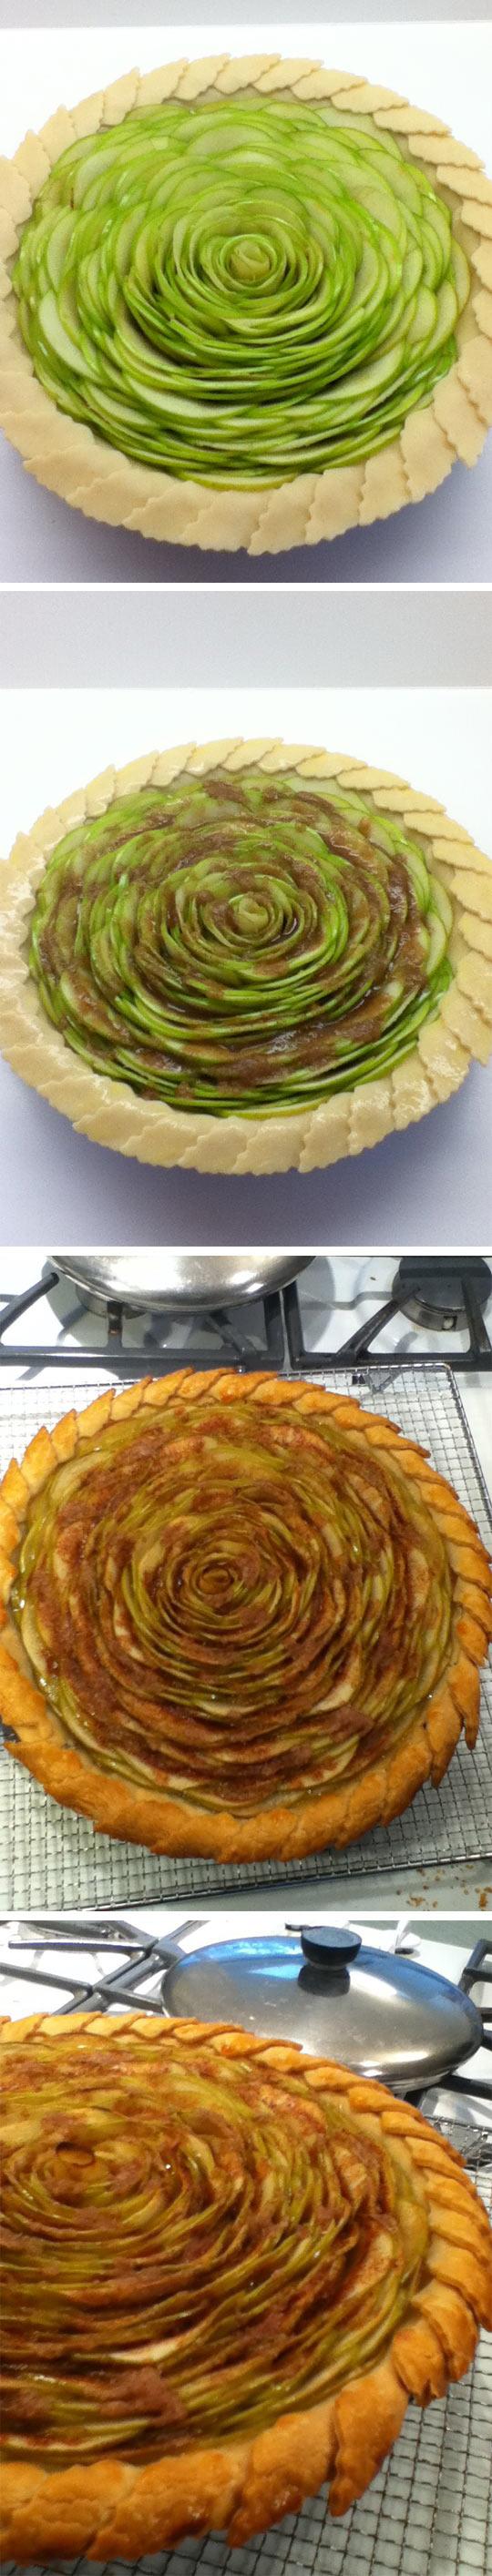 funny-pie-Thanksgiving-apple-flower